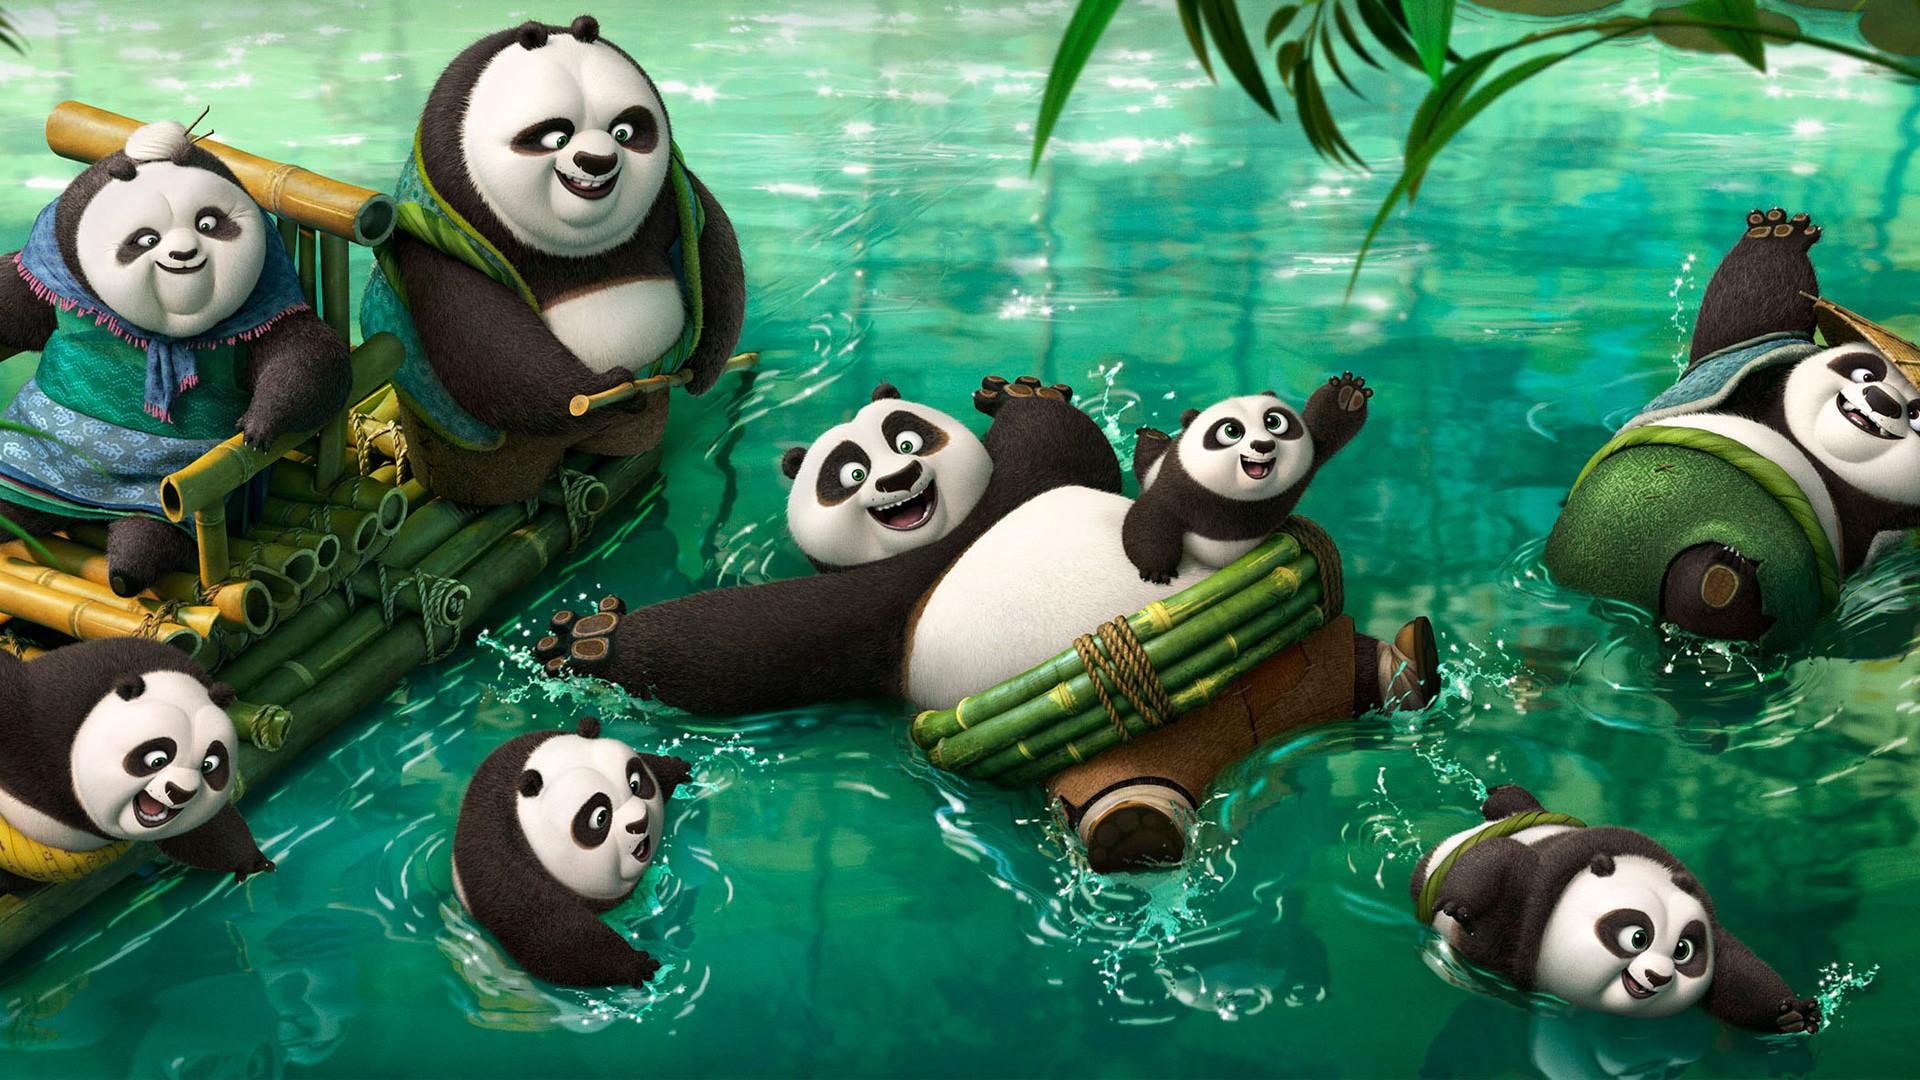 Kung fu Panda 3 New Pandas